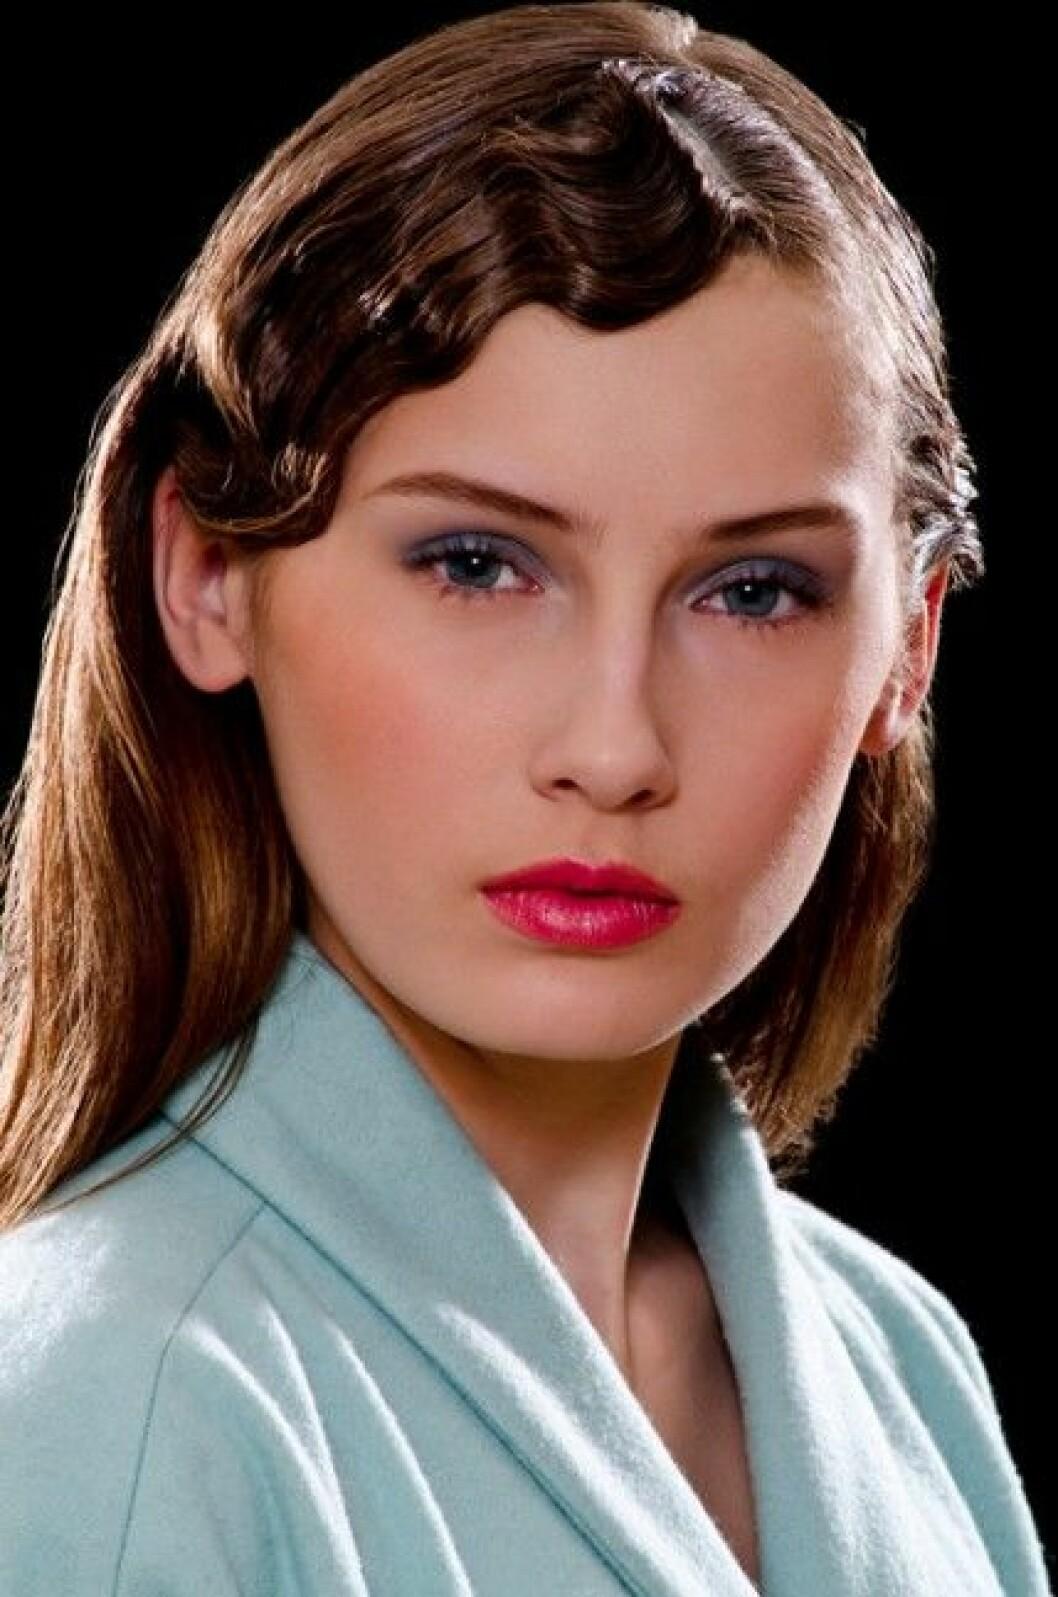 Carin Wester, A/W 2011. Modell: Molly O, Mikas